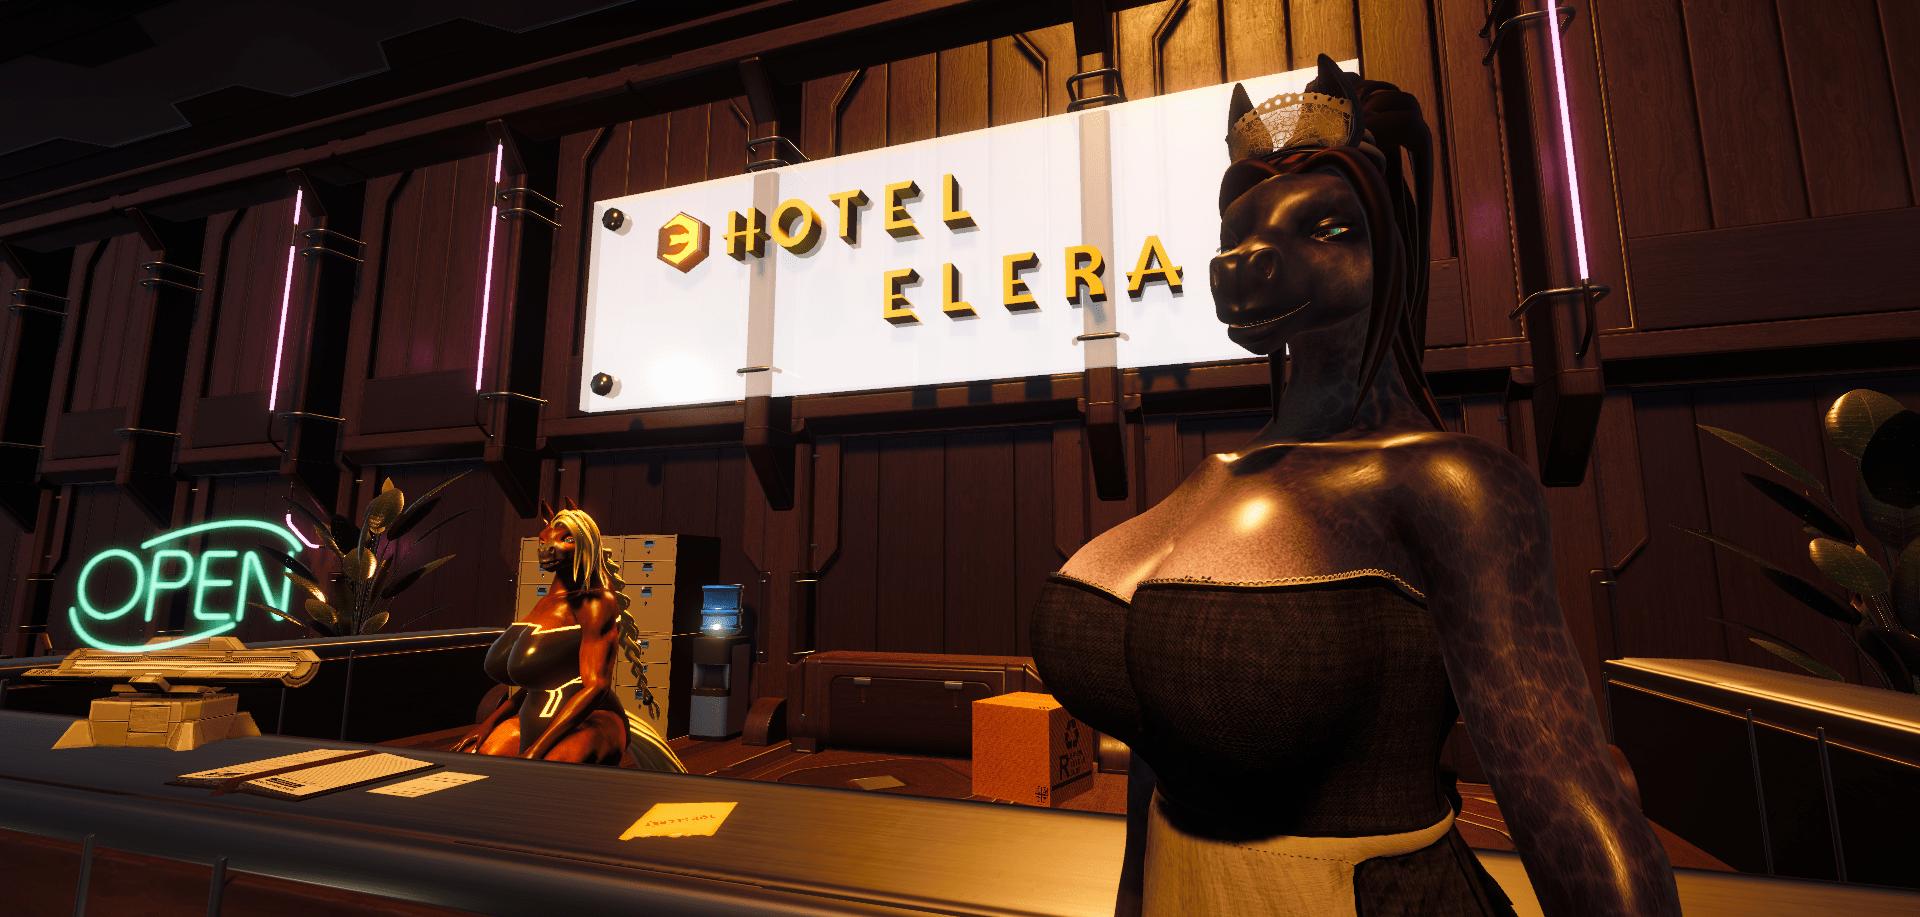 PROJECT ELERA - Hotel Elera VR Porn GamePROJECT ELERA - Hotel Elera VR Porn Game